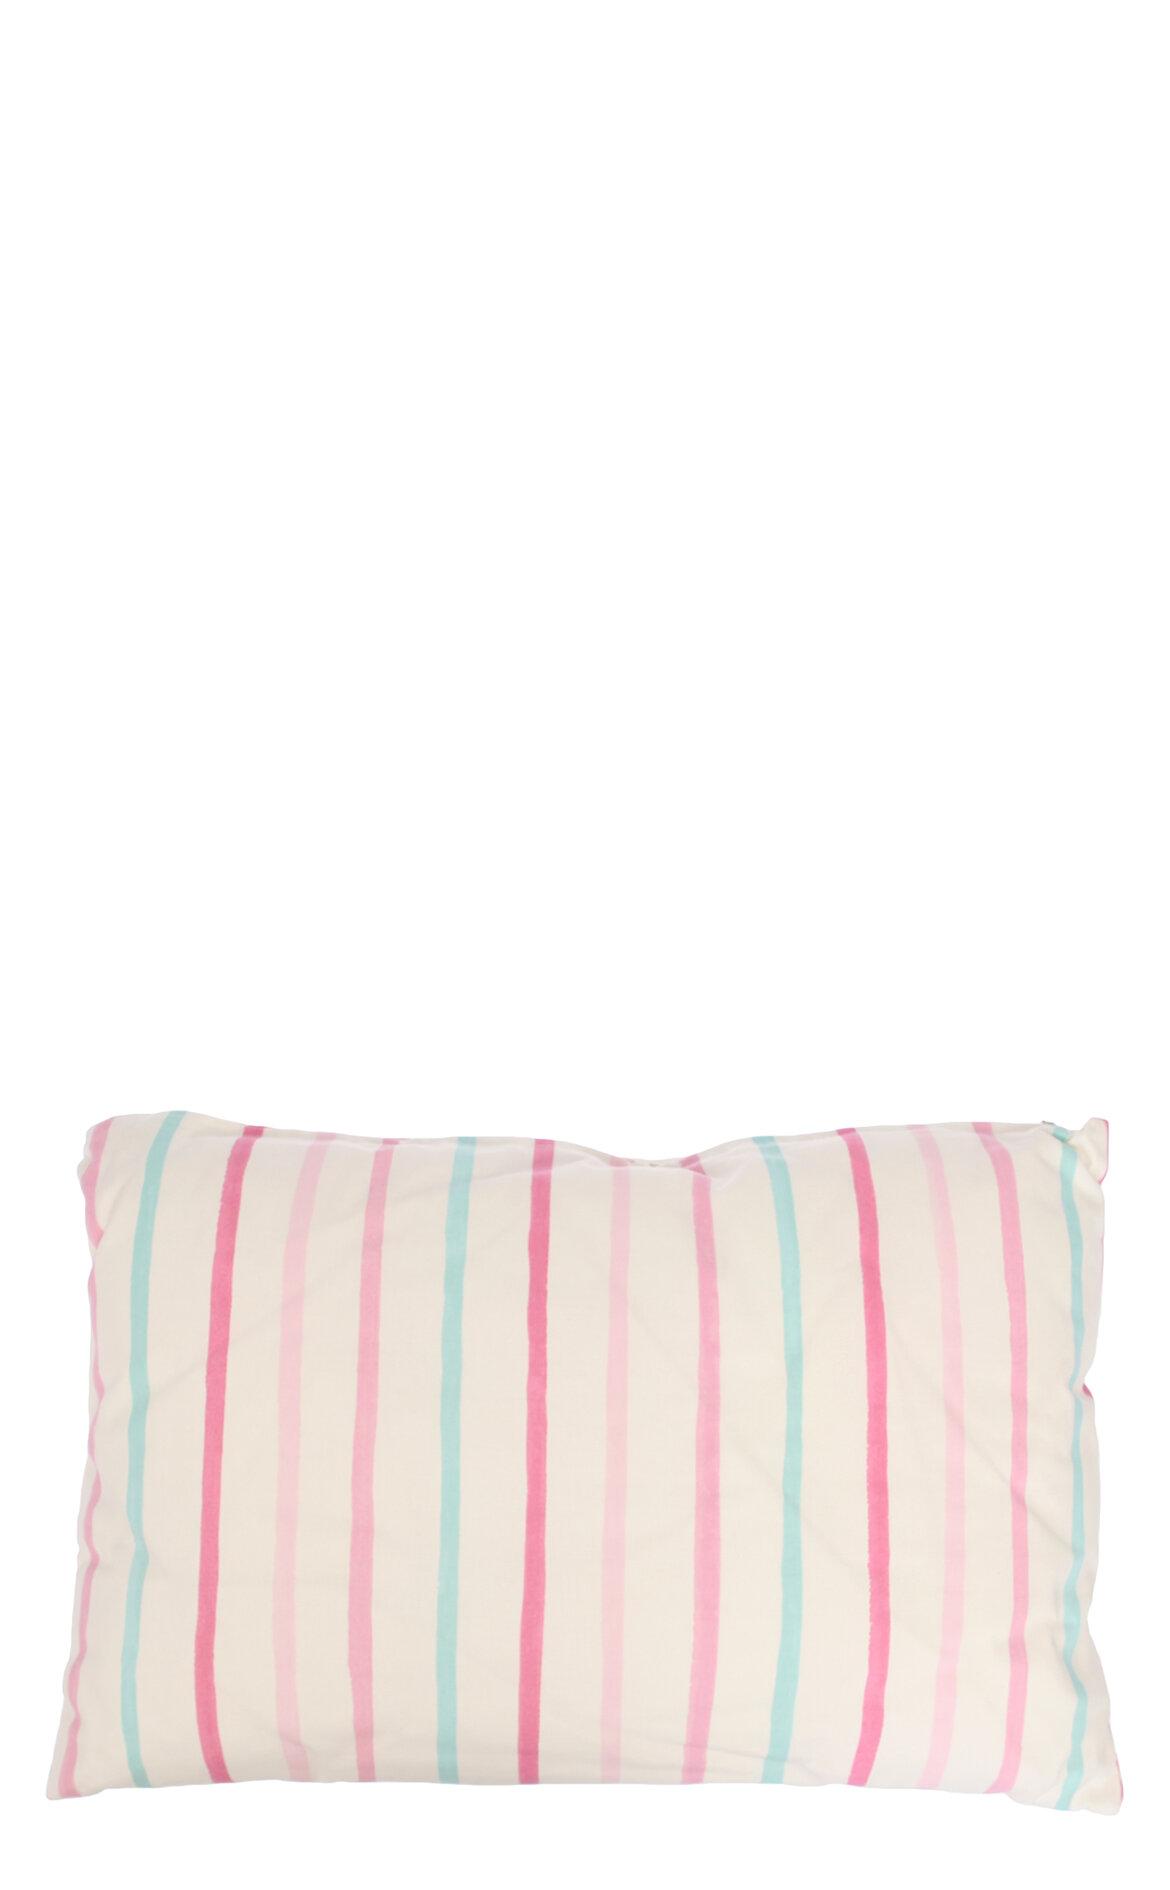 Laura Ashley-Laura Ashley Painterly Stripe Cdf Pink 40X60 cm Dekoratif Yastık